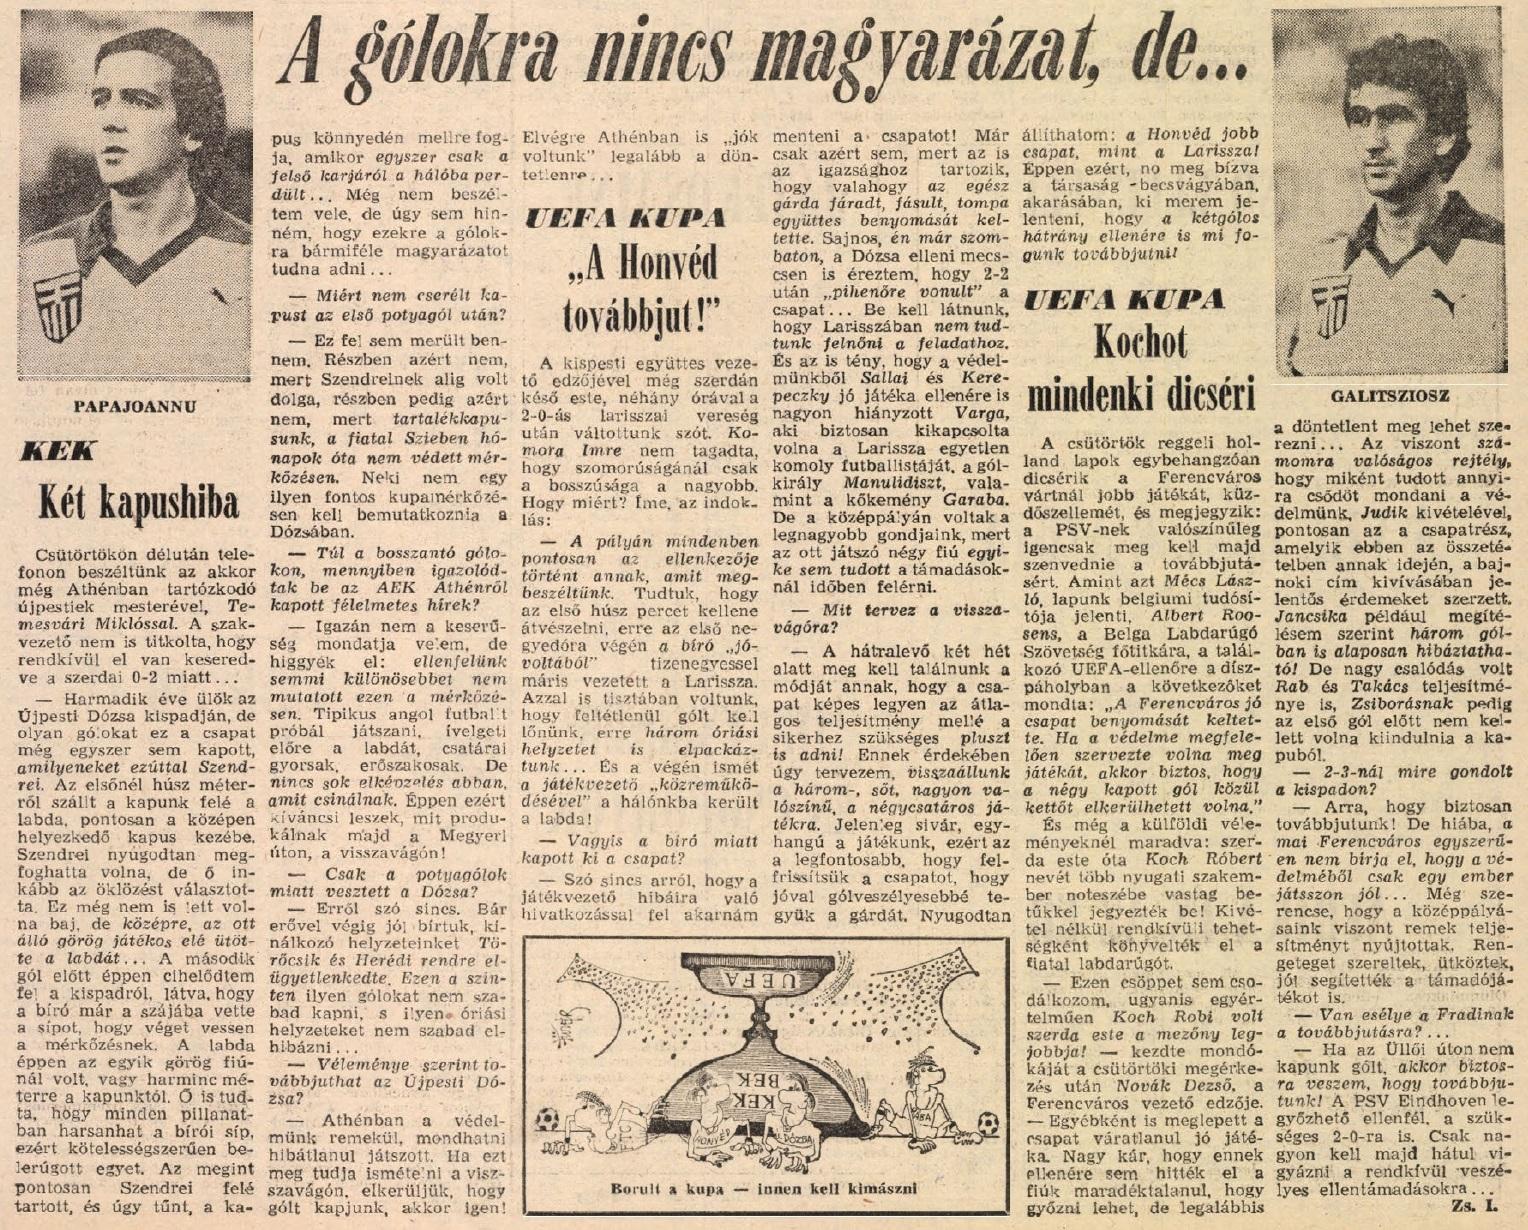 idokapszula_nb_i_1983_84_klubcsapataink_nemzetkozi_kupaszereplese_1_fordulo_1_kor_magyar_kupaszerda.jpg